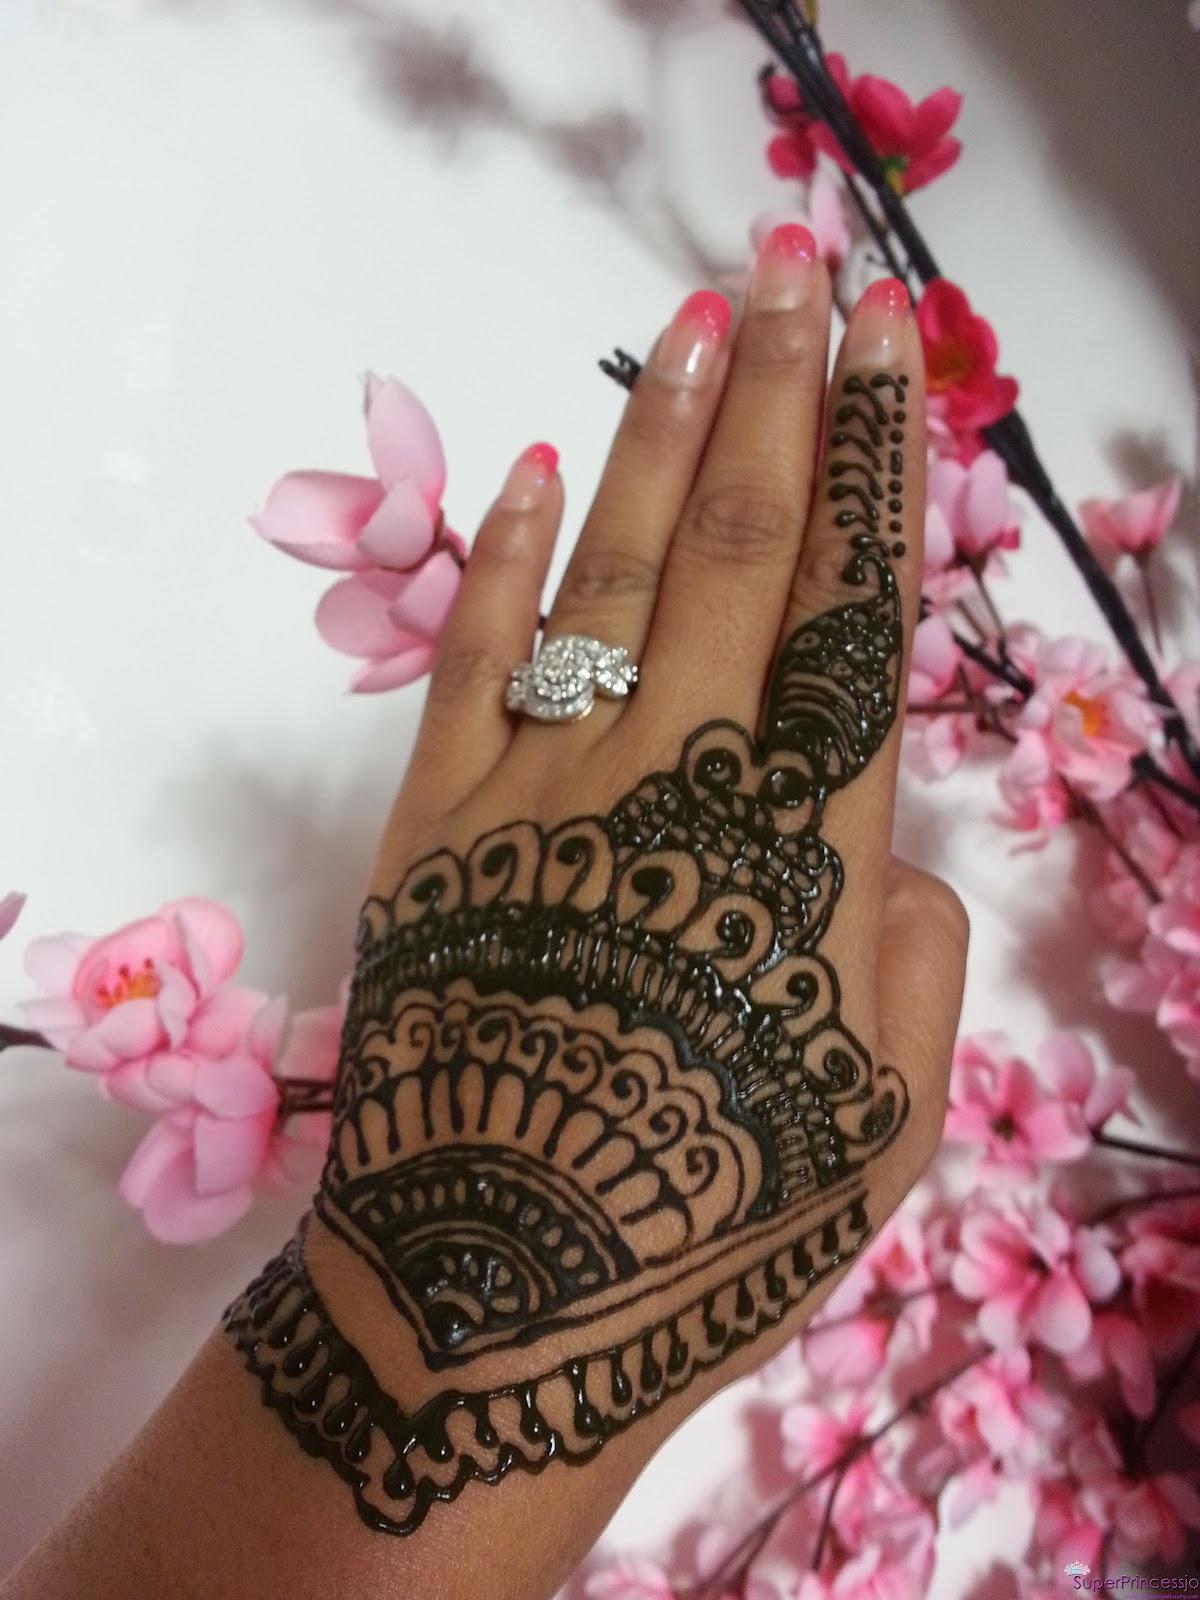 Superprincessjo easy simple henna design and how to make henna paste easy simple henna design and how to make henna paste solutioingenieria Gallery